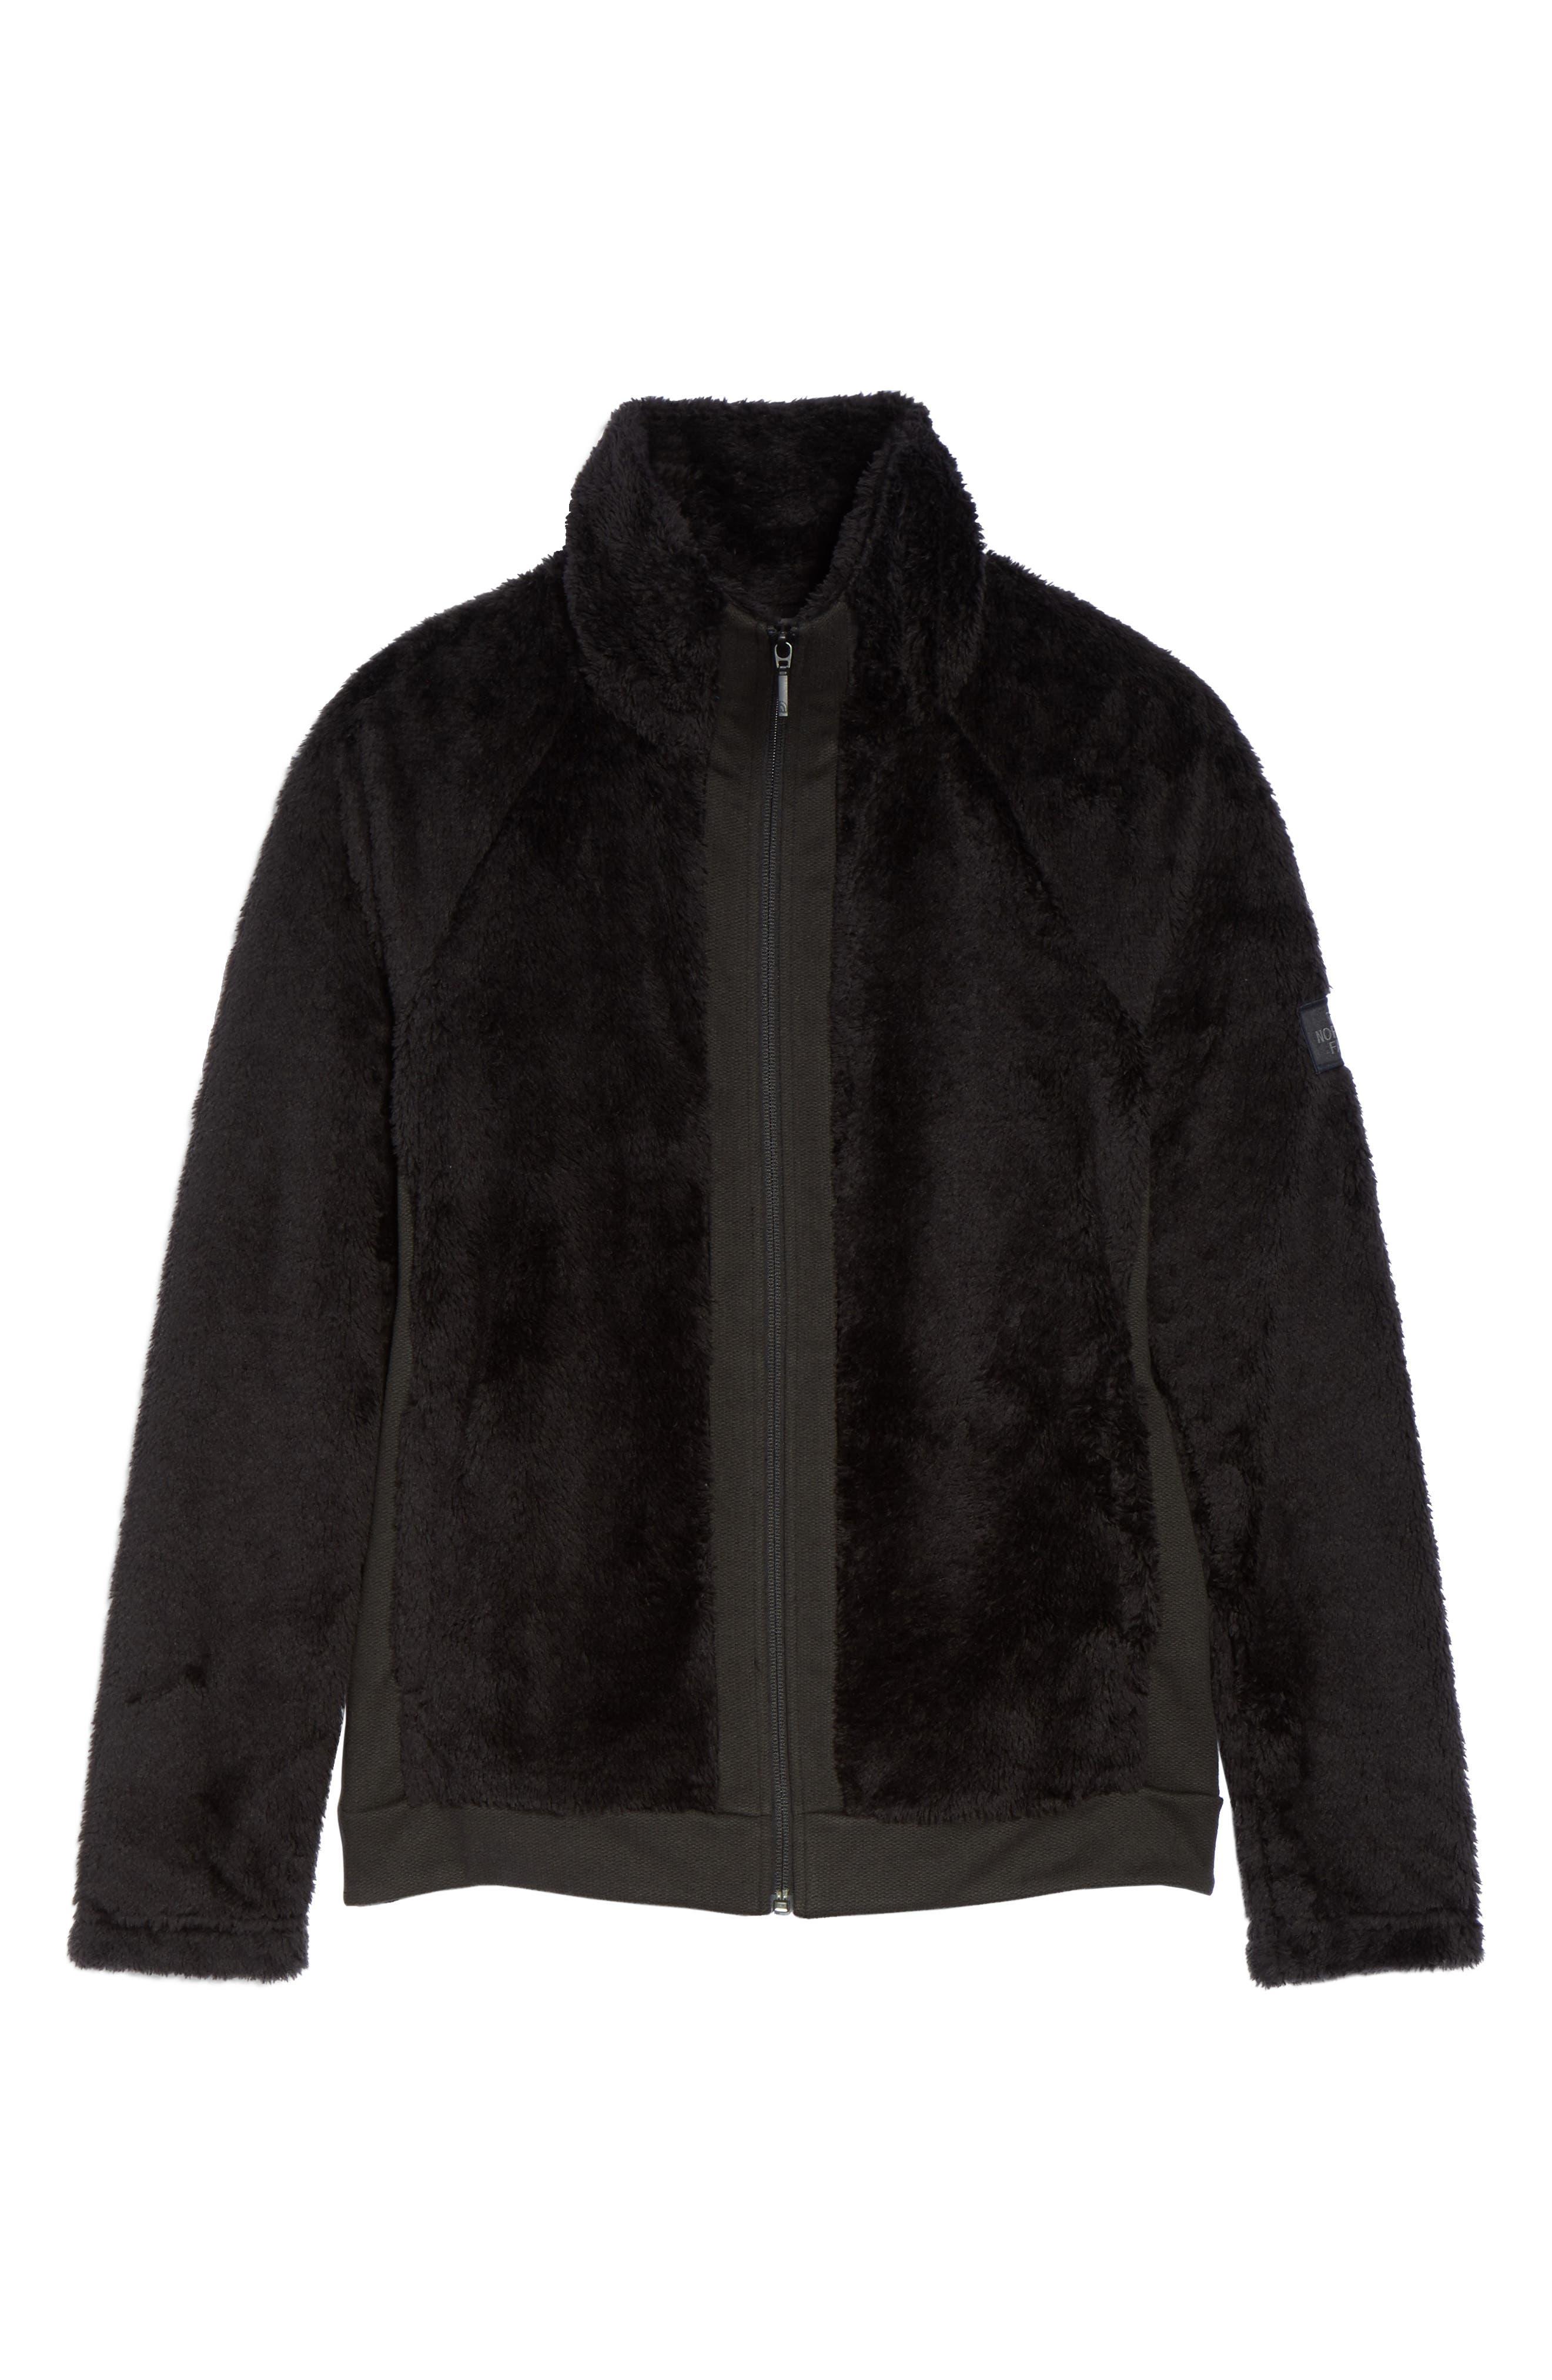 THE NORTH FACE, Furry Fleece Jacket, Alternate thumbnail 6, color, TNF BLACK